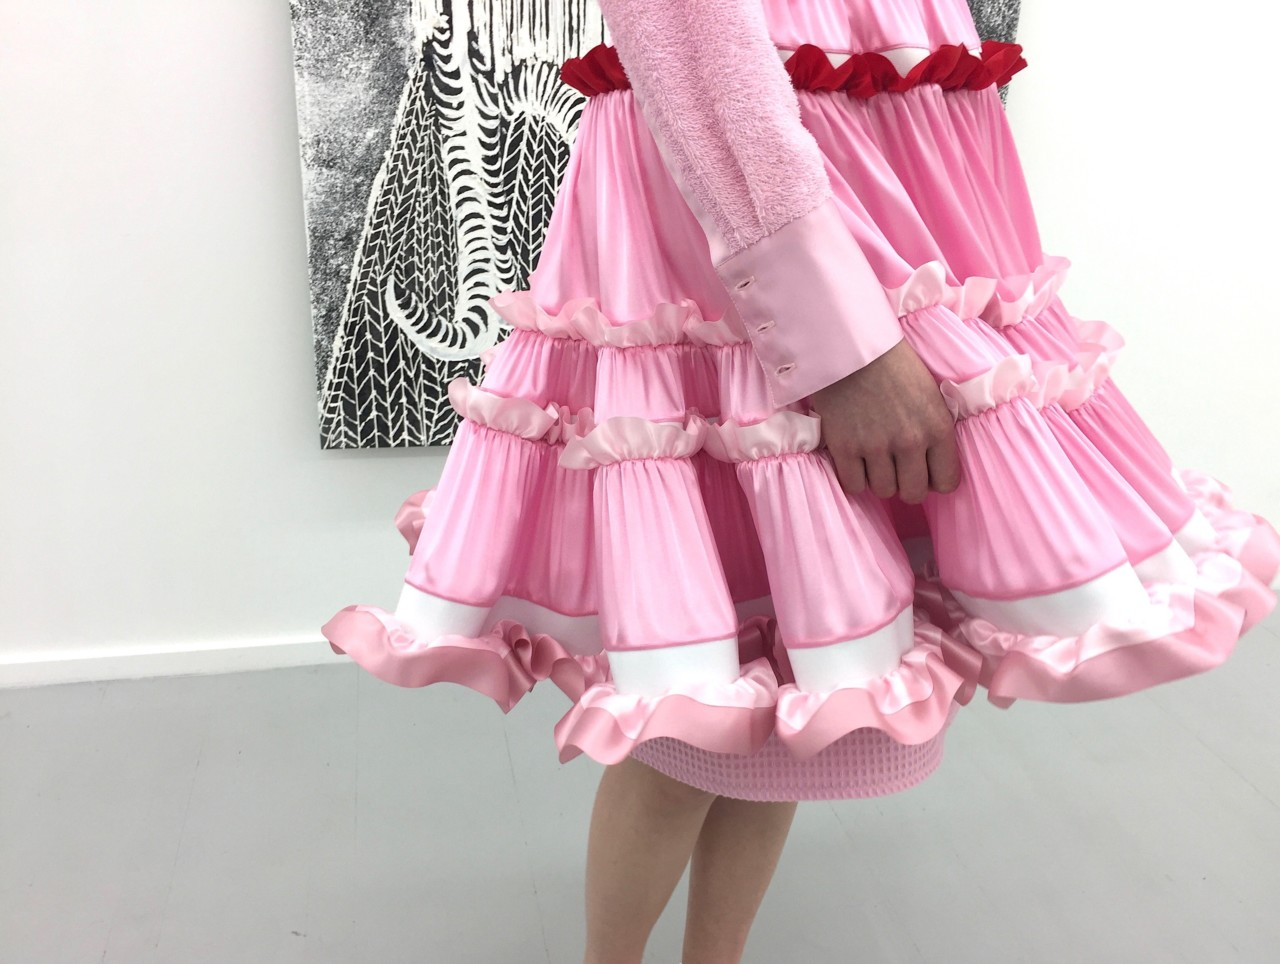 admir-batlak-kremkake-skirt-spring-summer-2018-anja-stang